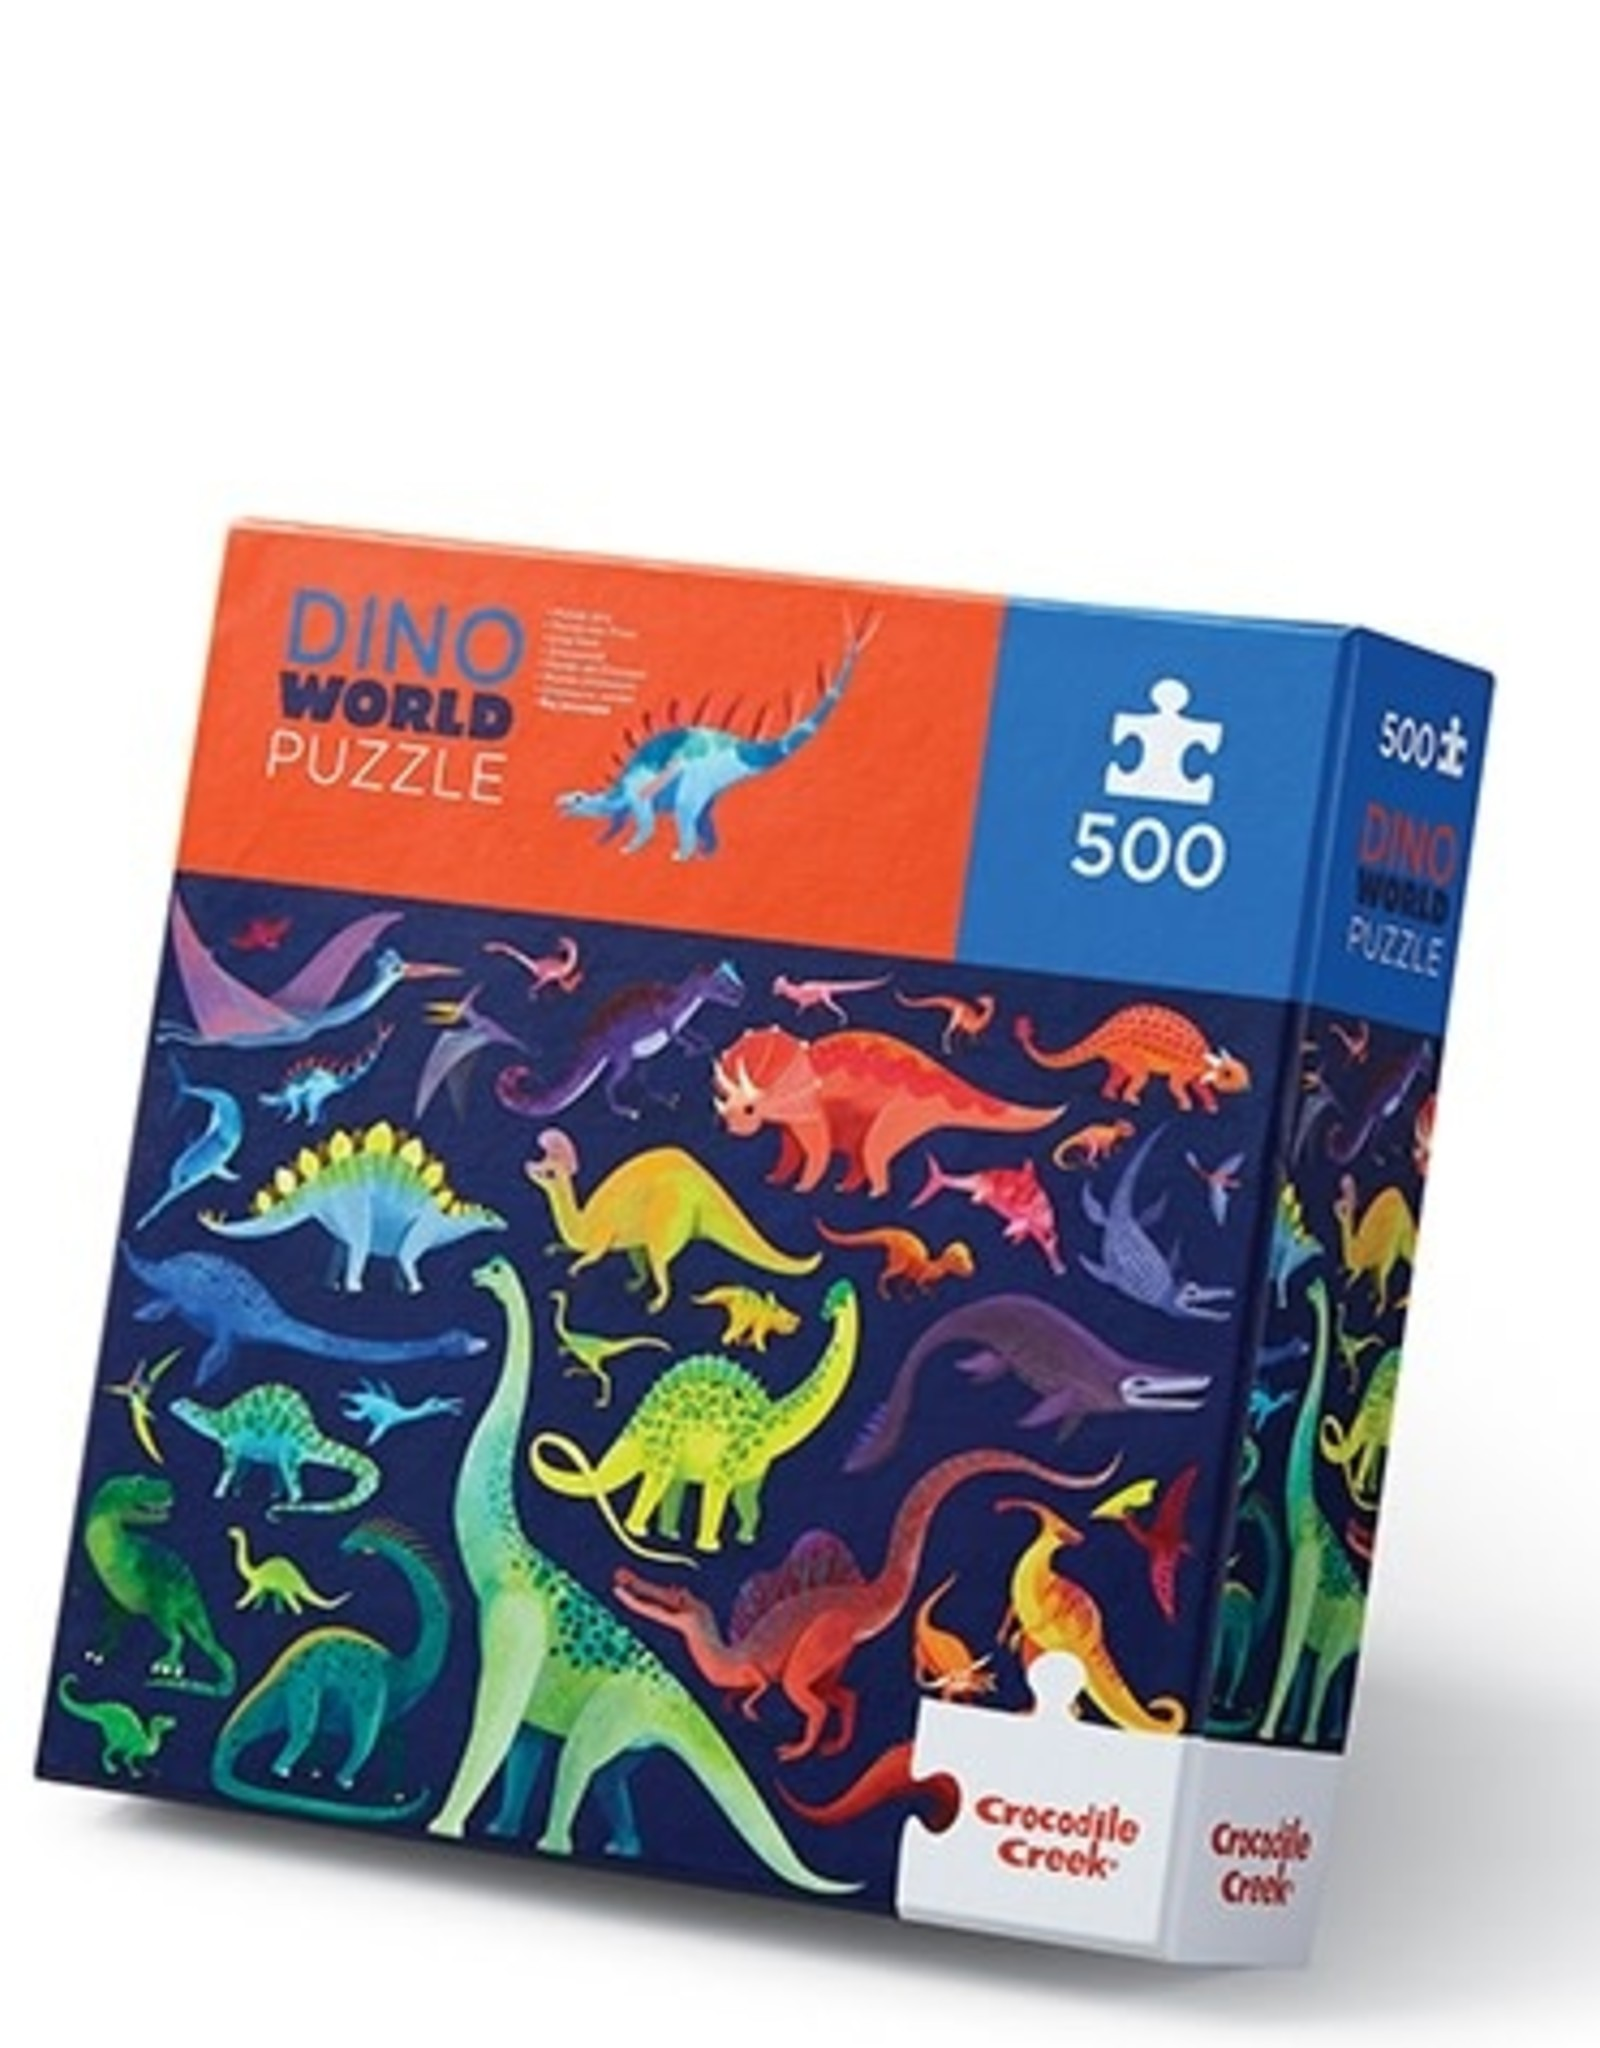 Crocodile Creek 500-PC BOXED/DINO WORLD